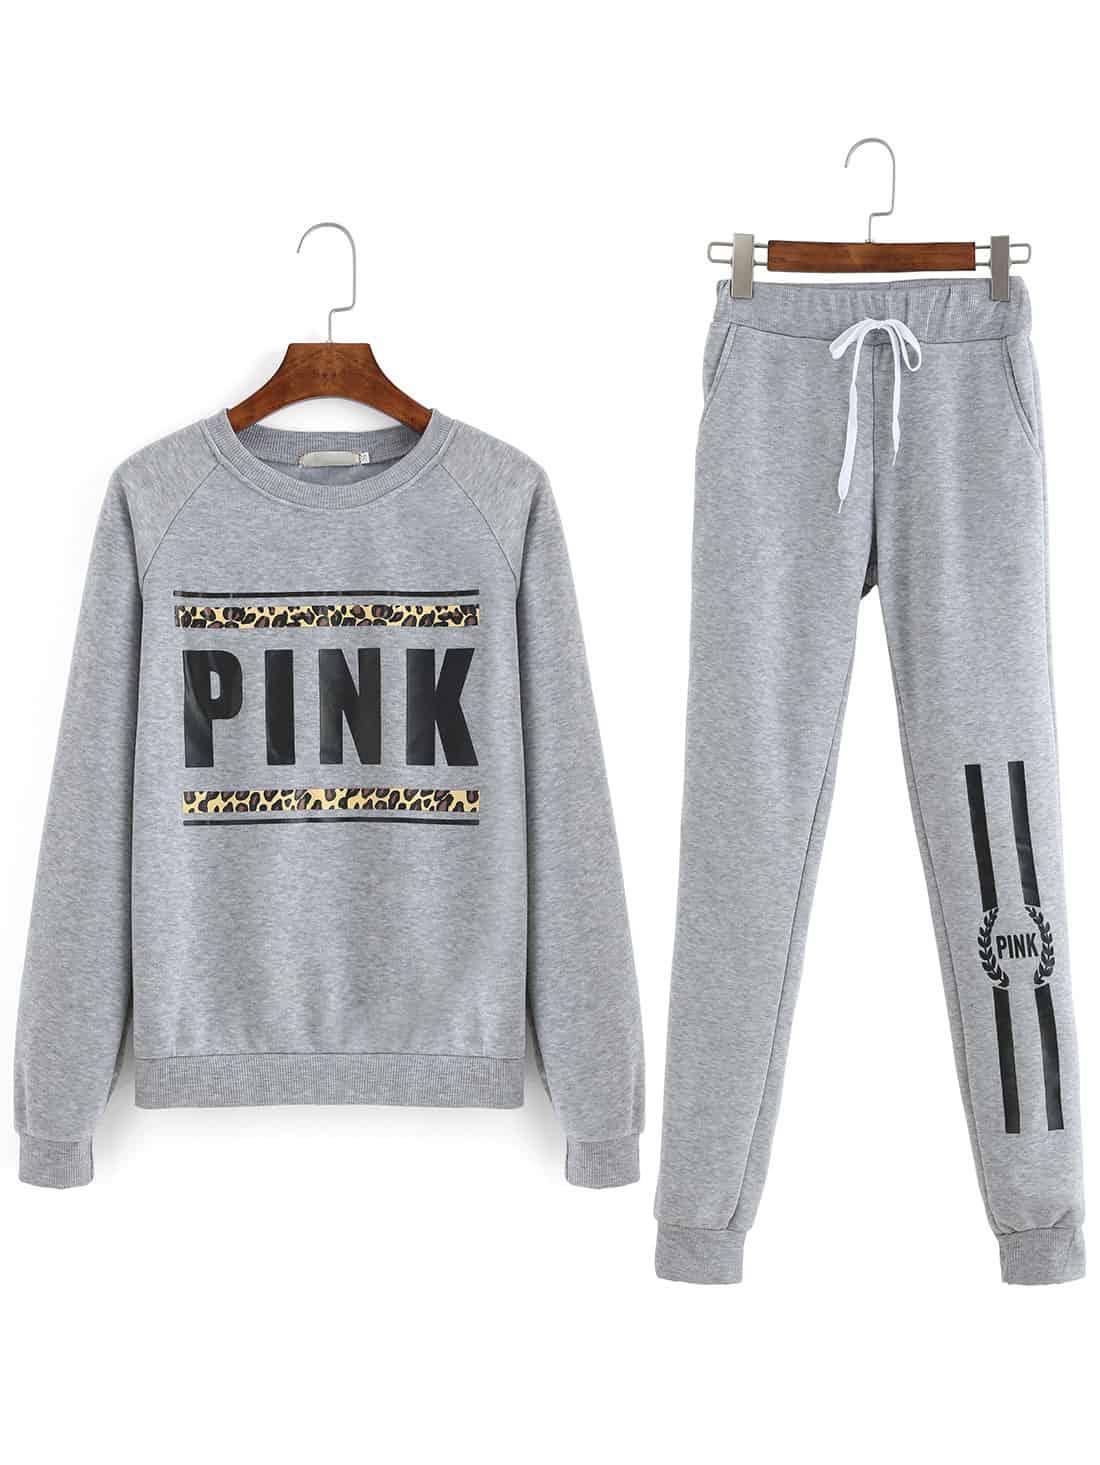 Romwe pink sweat suit